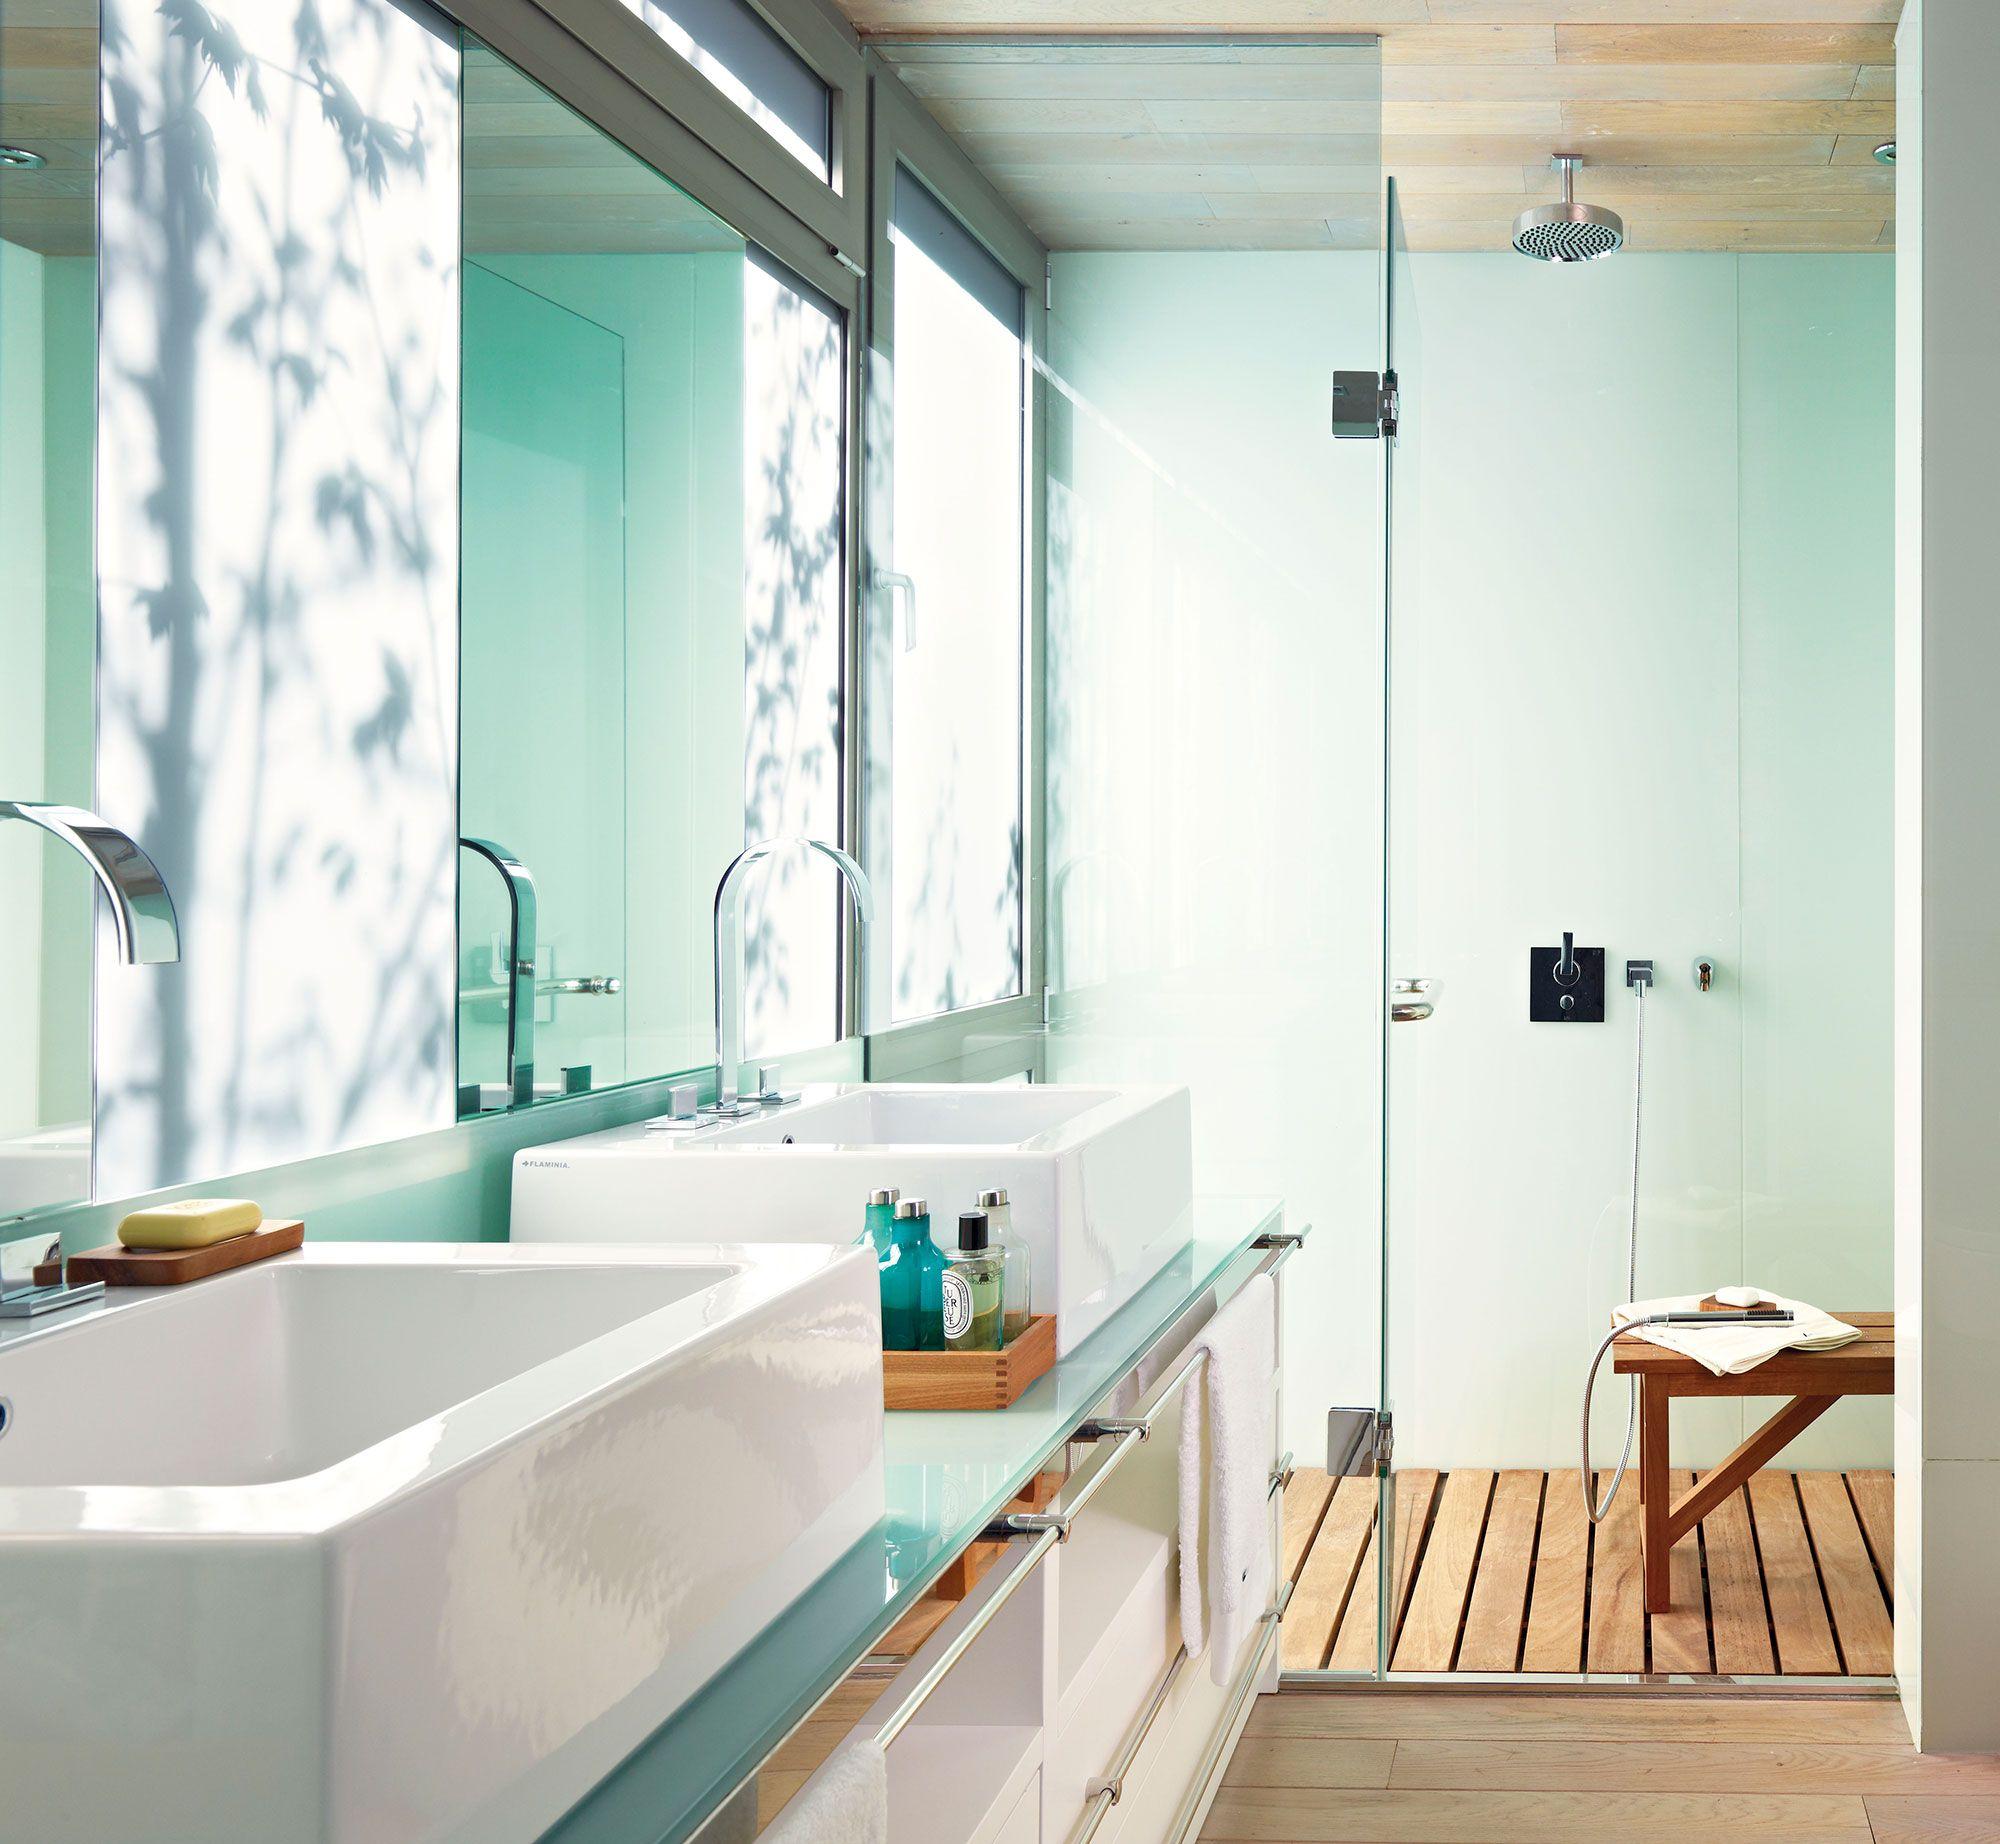 C mo limpiar la puerta de vidrio de una ducha como decirle puertas de vidrio y duchas - Como limpiar el plato de ducha ...